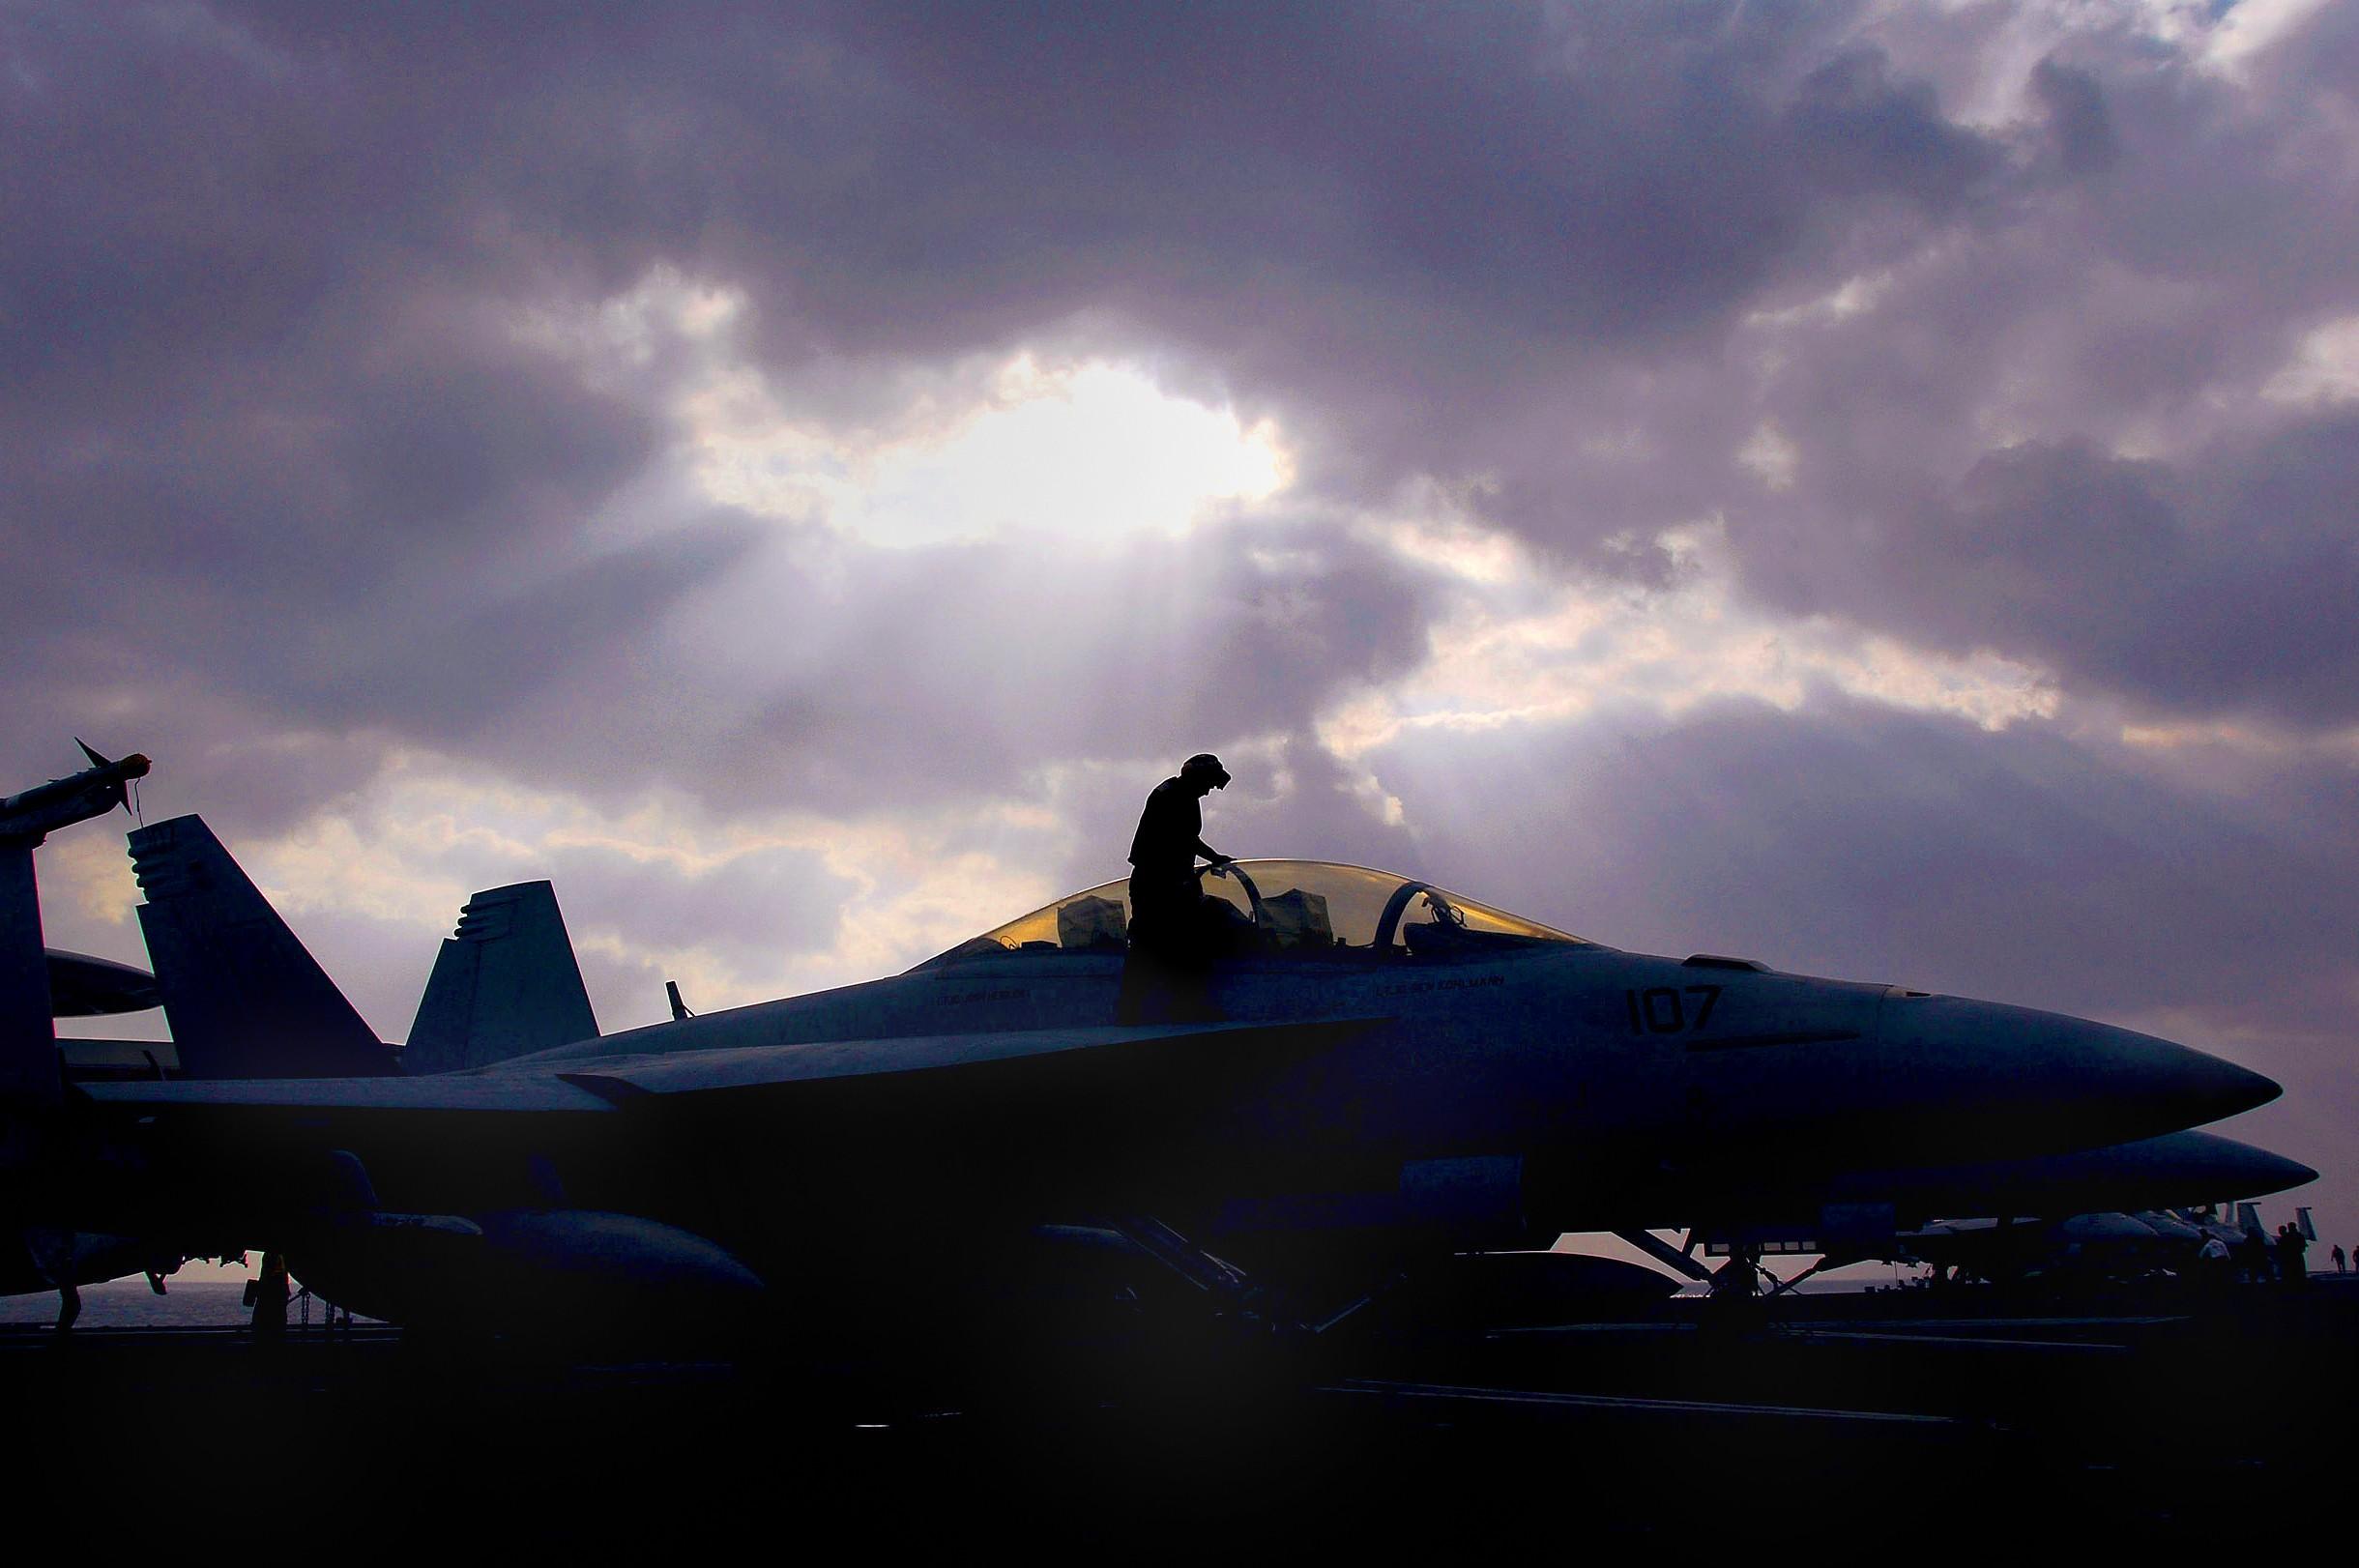 Обои Mcdonnell douglas, истребитель, Самолёт, eagle, Облака. Авиация foto 10